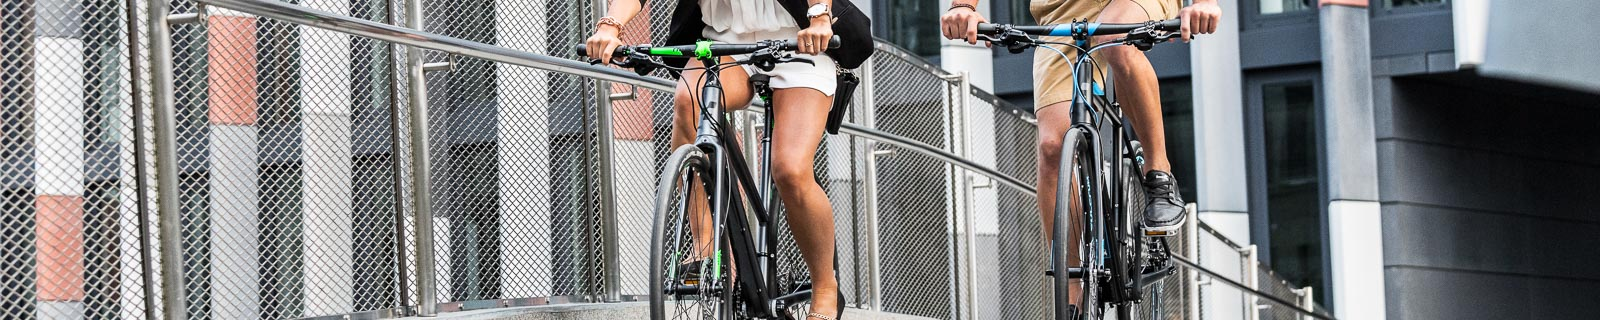 Bicilette fitness e bici da fitness